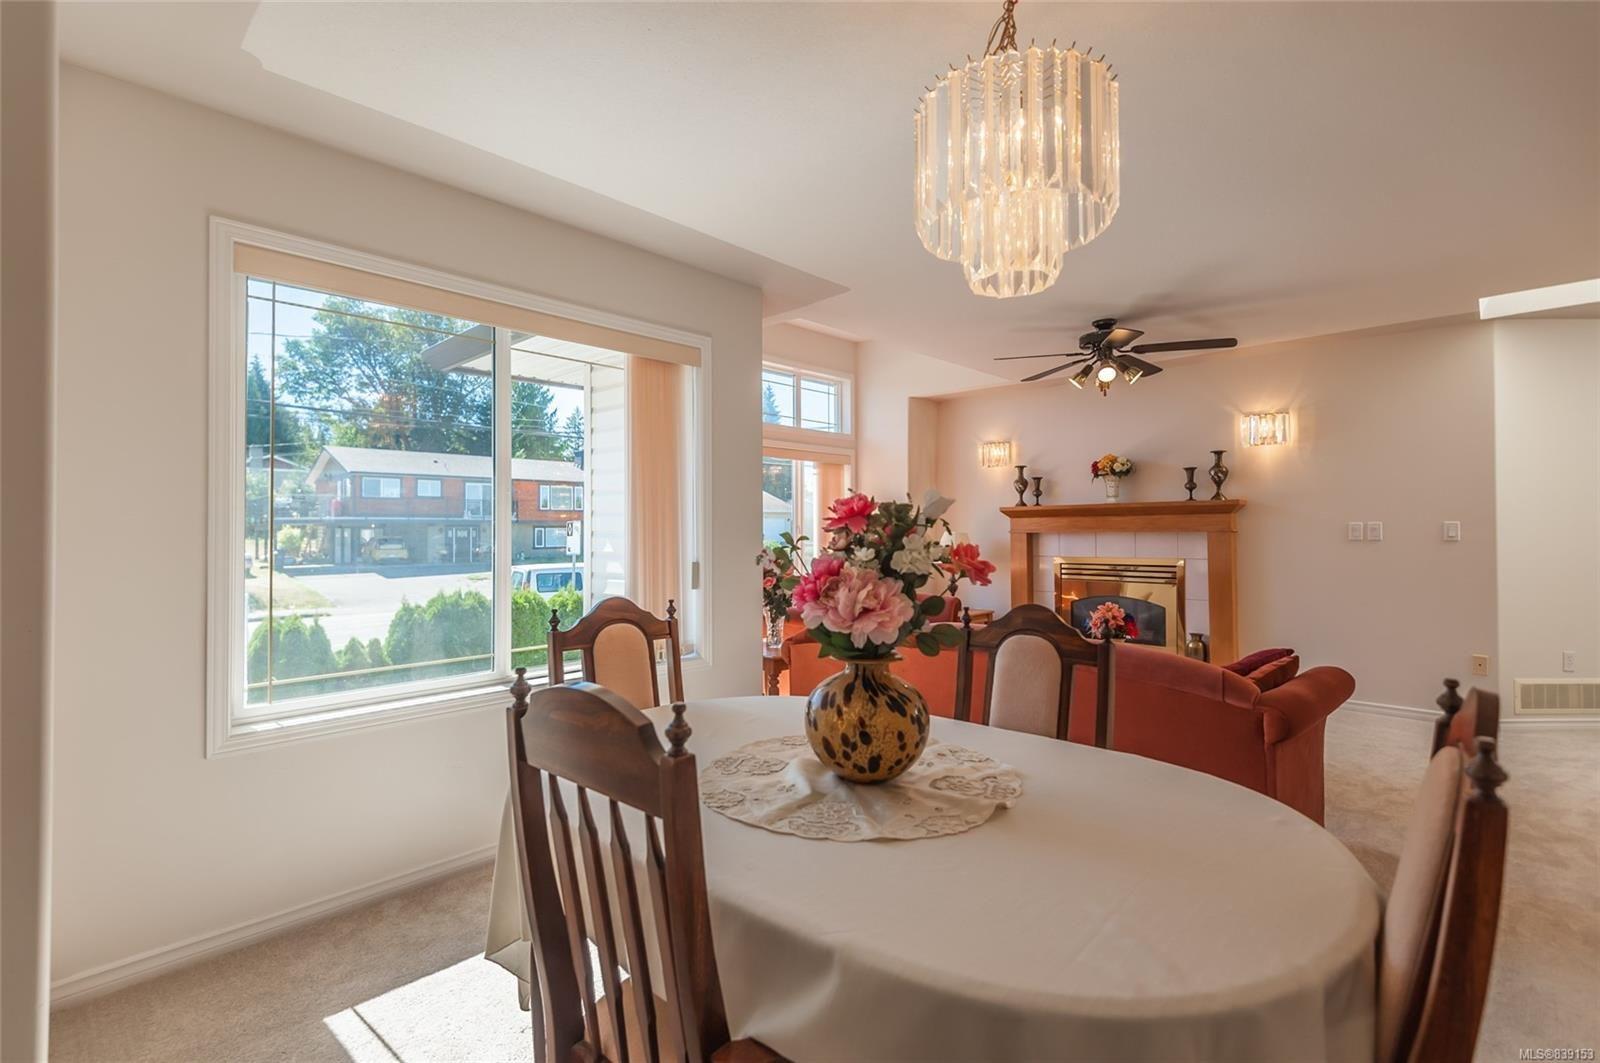 Photo 21: Photos: 6412 Dover Rd in NANAIMO: Na North Nanaimo House for sale (Nanaimo)  : MLS®# 839153